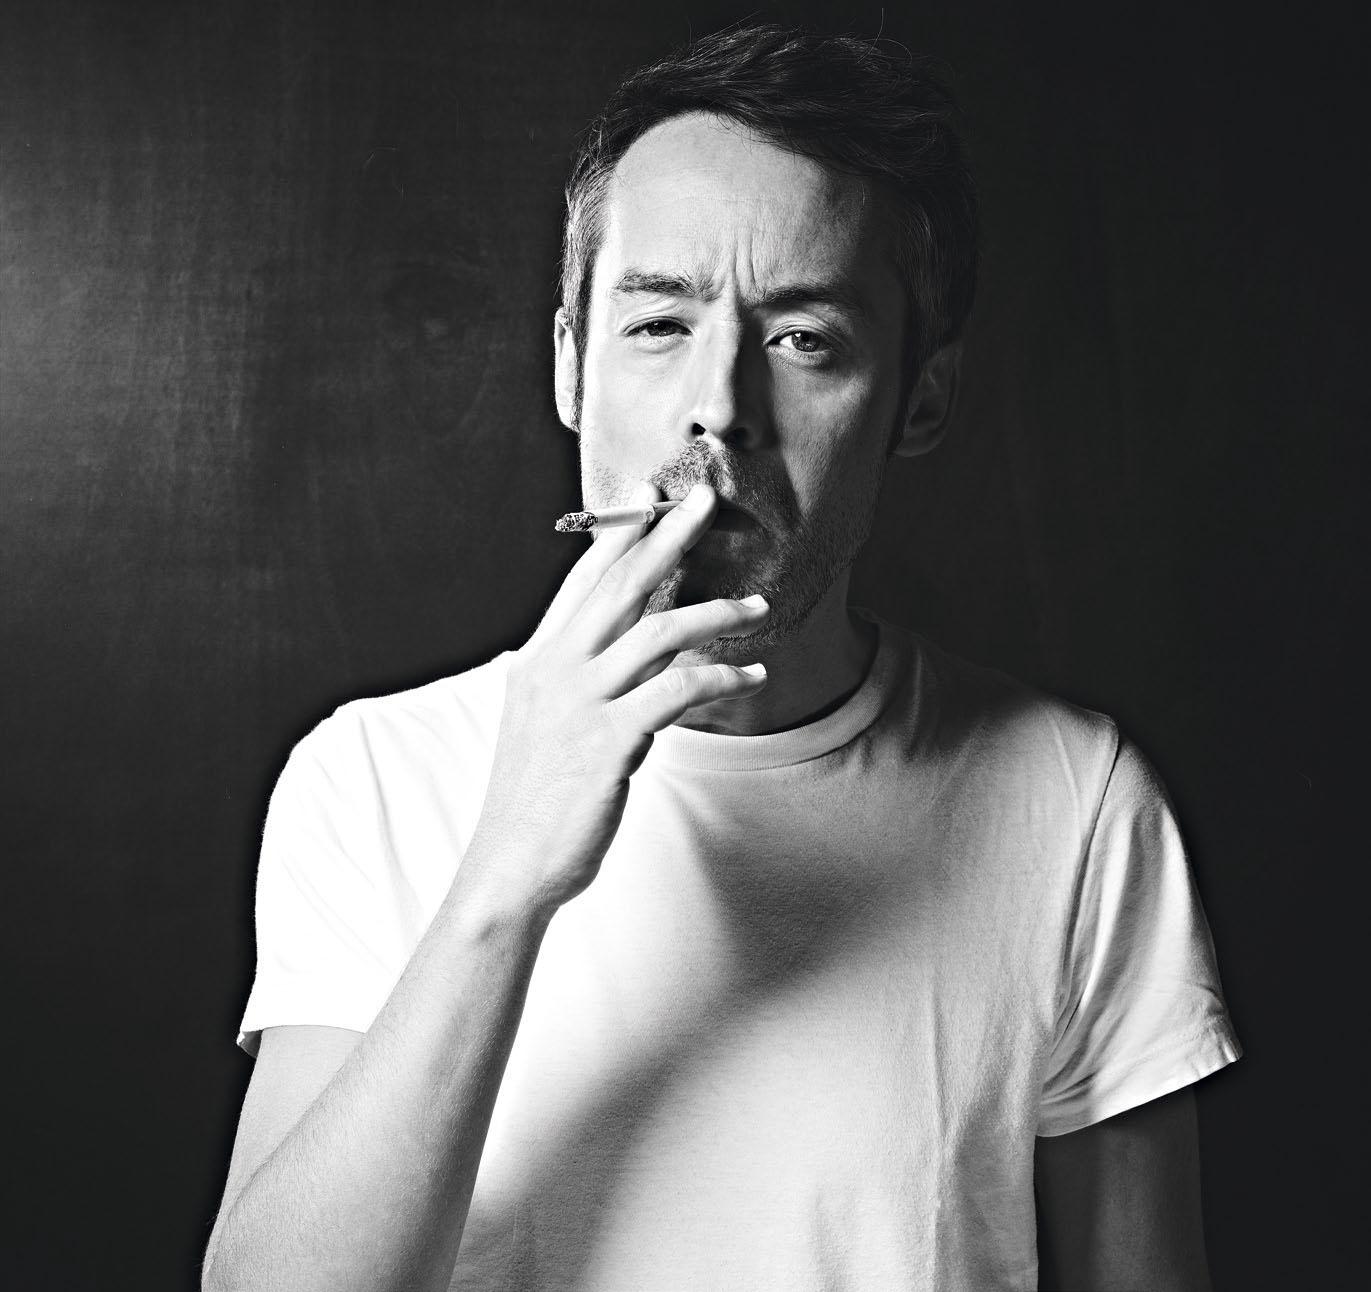 Yann Barthès technikart